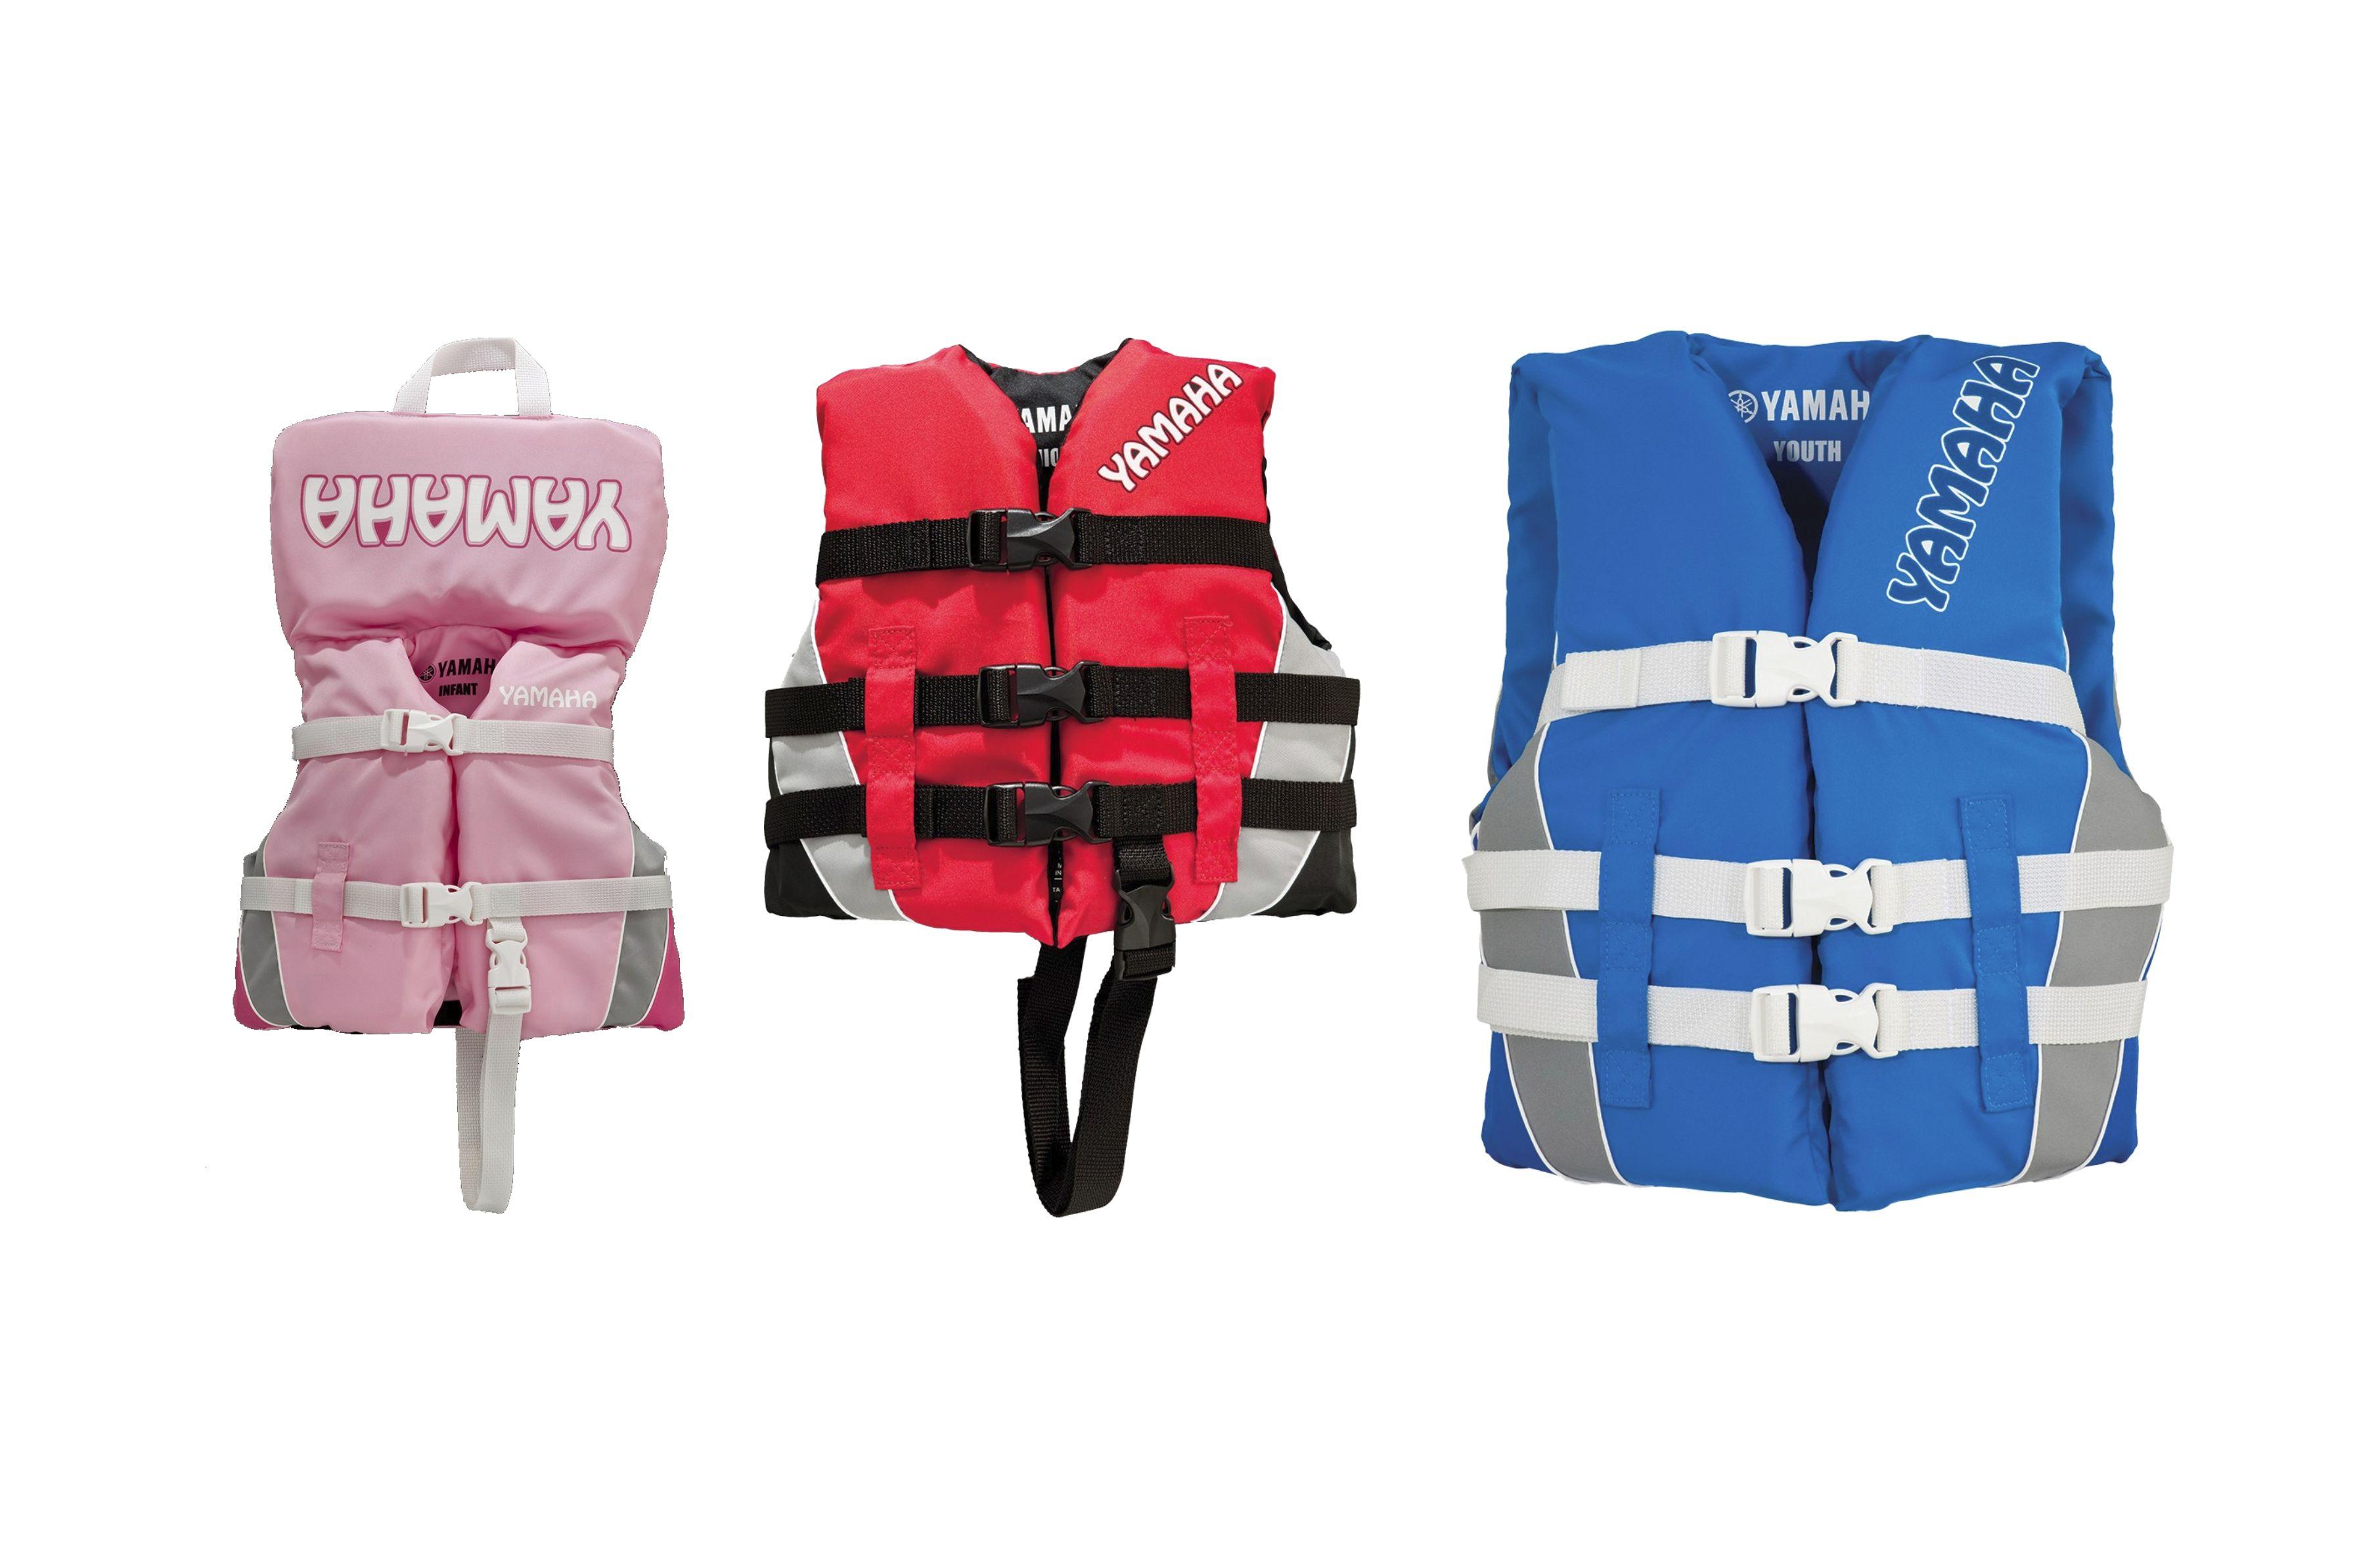 Oem Yamaha Waverunner Children S Nylon Life Jacket Vest Ebay